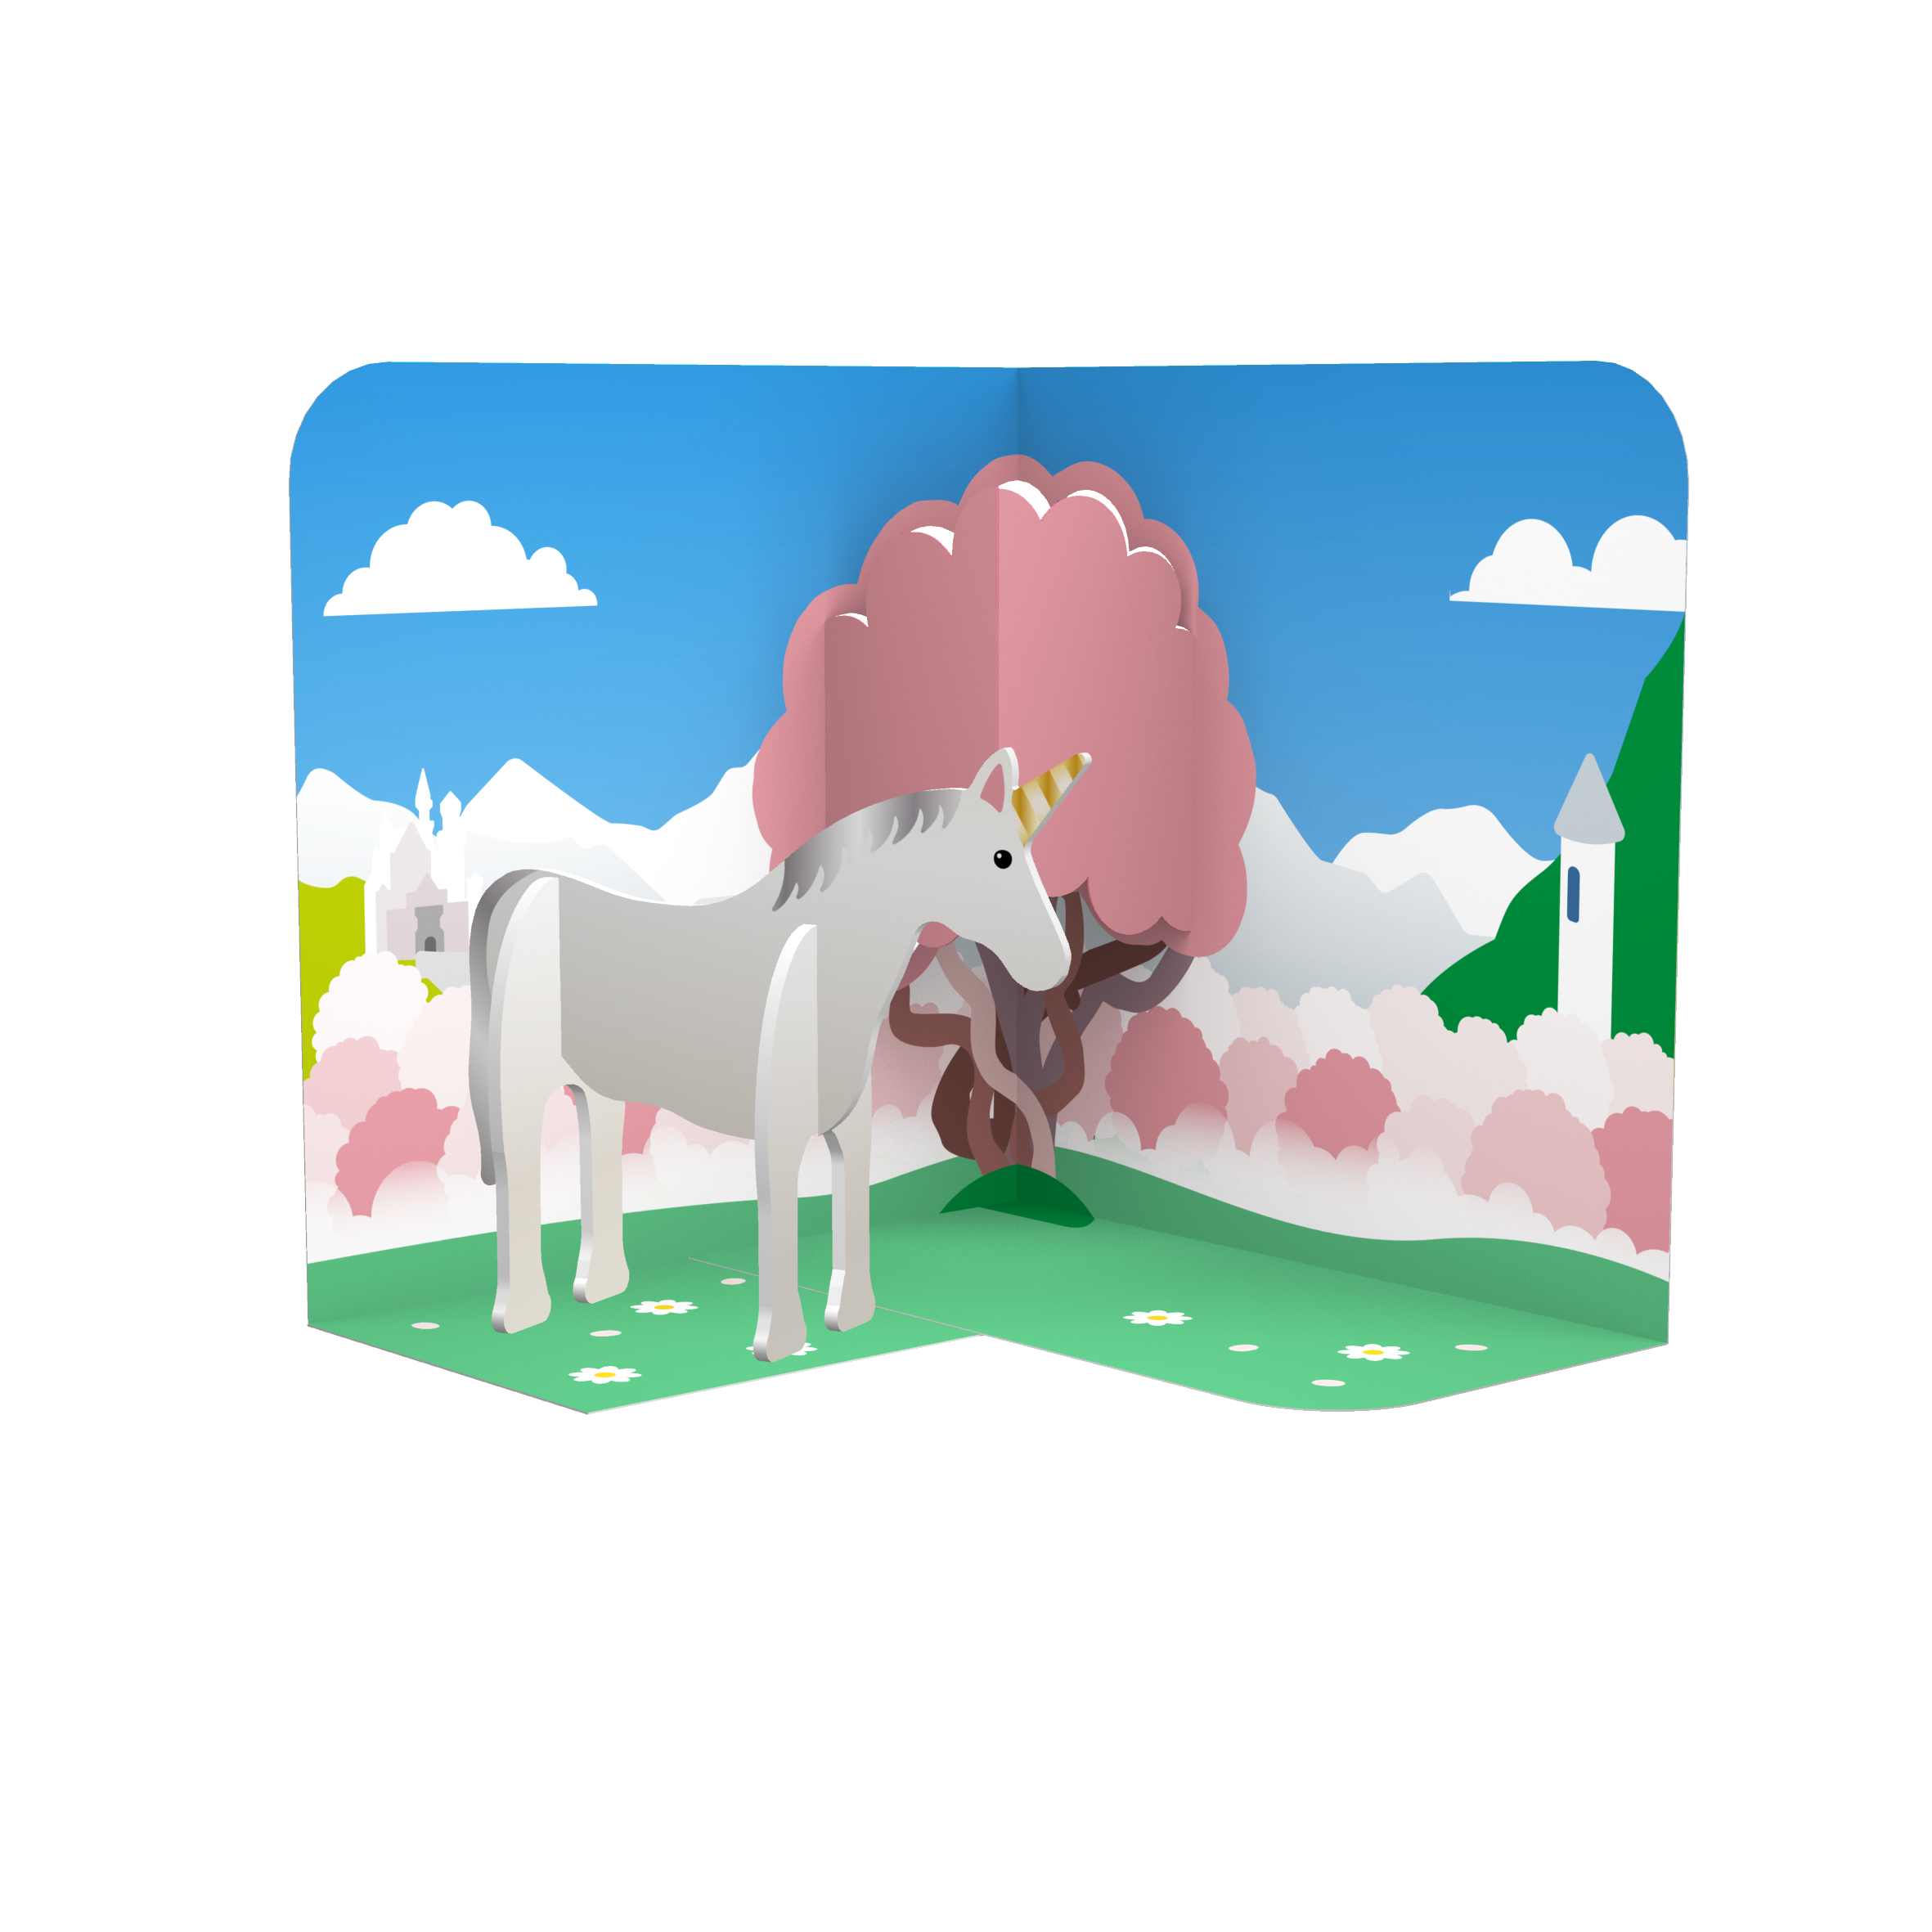 unicorn_card.png